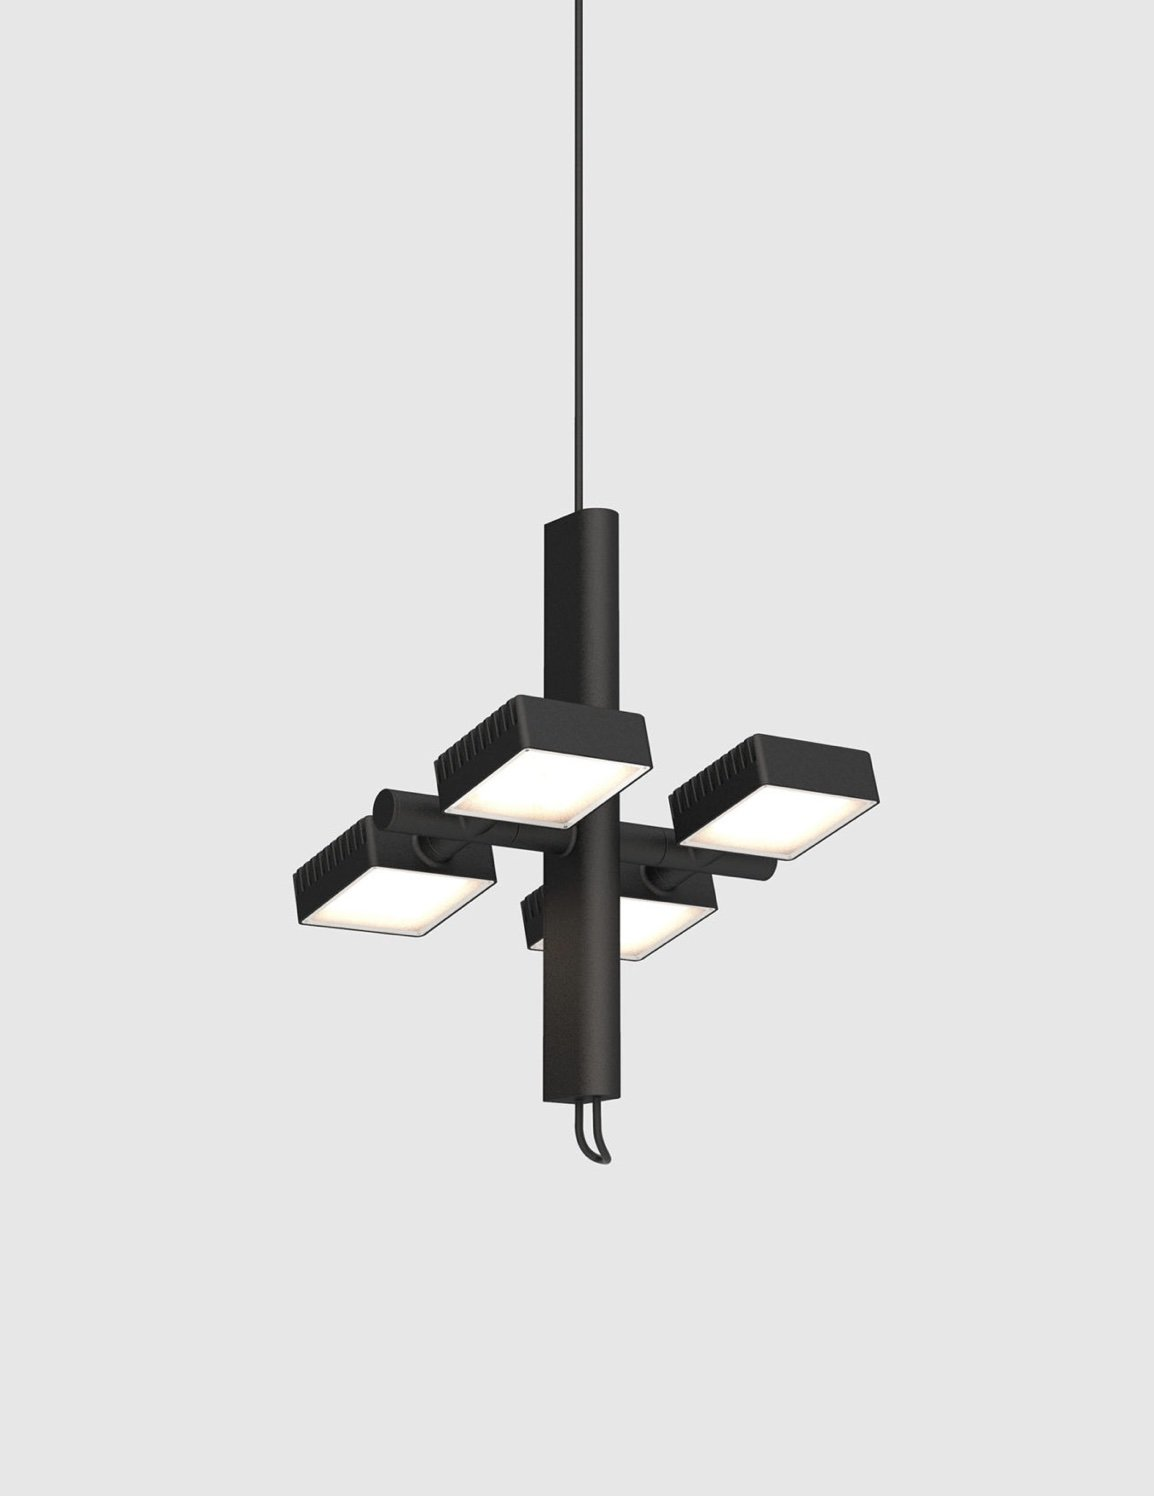 Lambert & Fils, Dorval 01 lighting, design SCMP Design Office